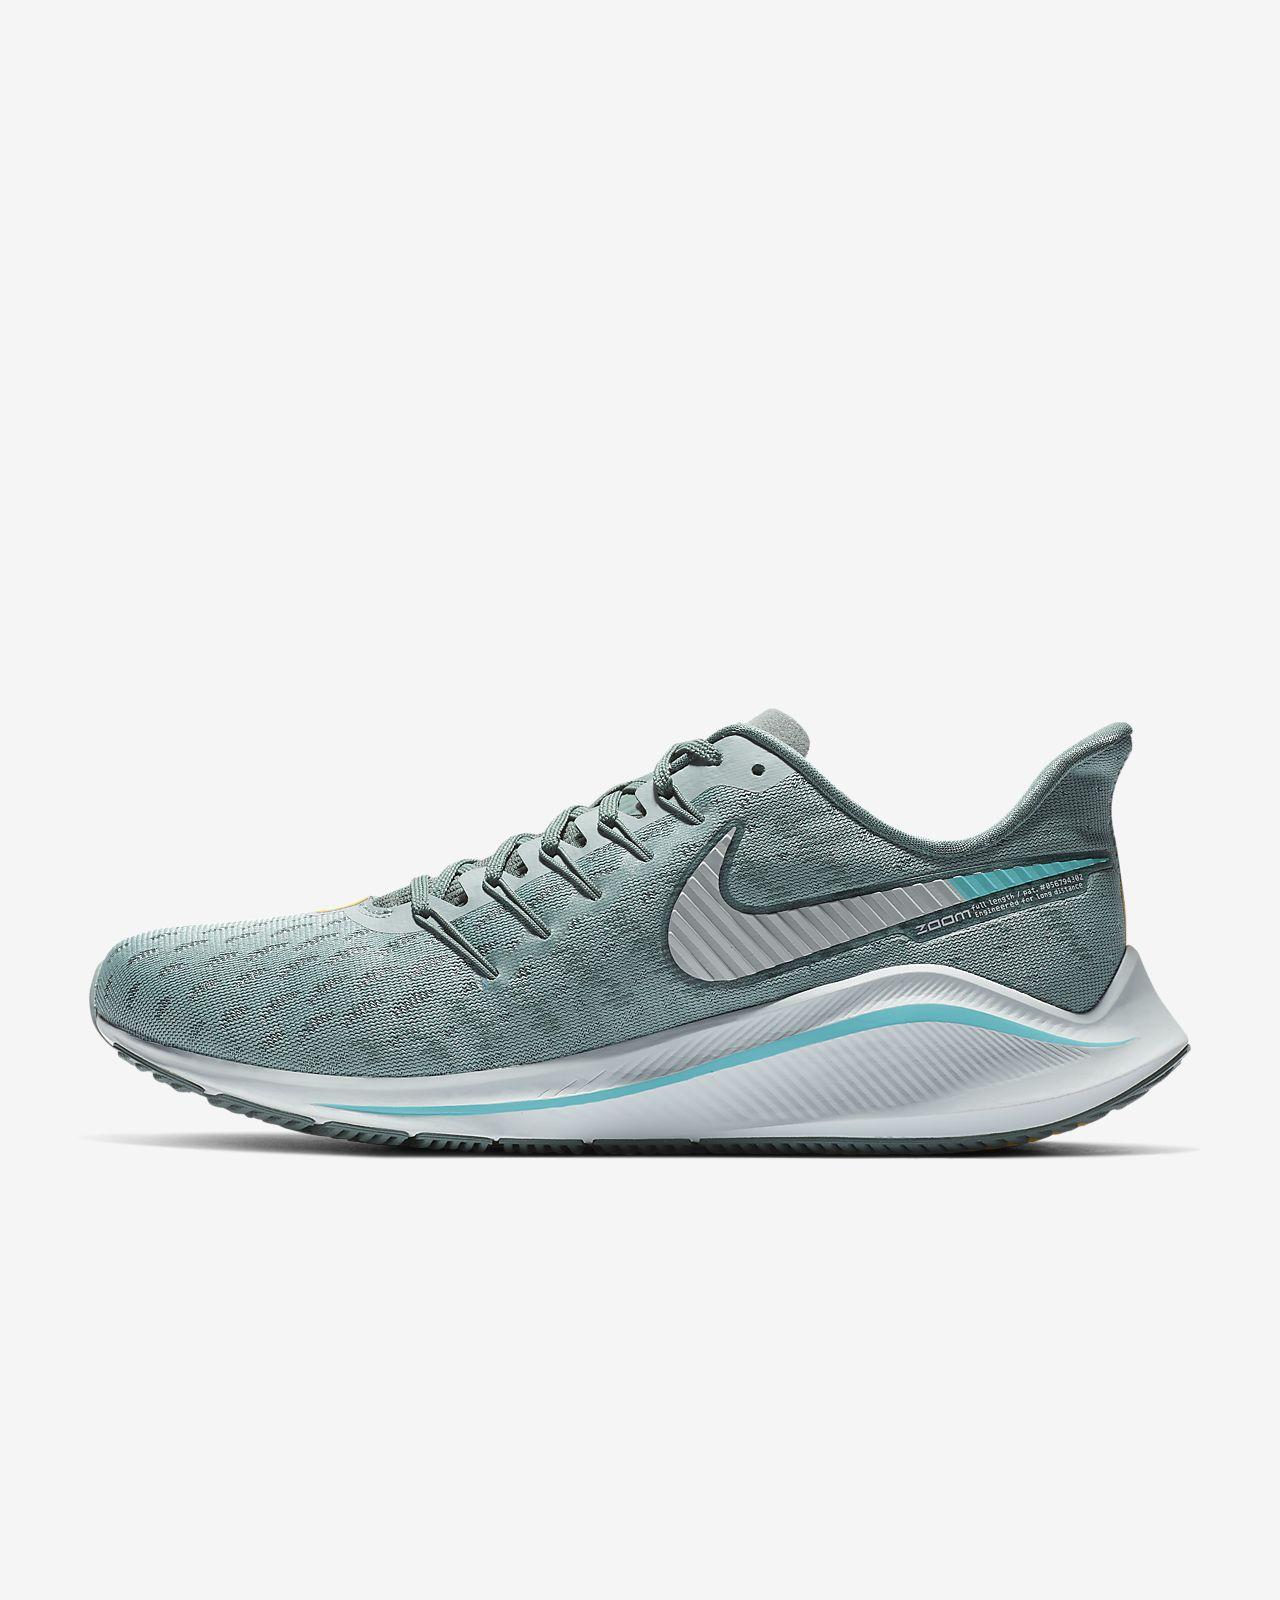 35cb2cd088e Nike Air Zoom Vomero 14 Men s Running Shoe. Nike.com NO